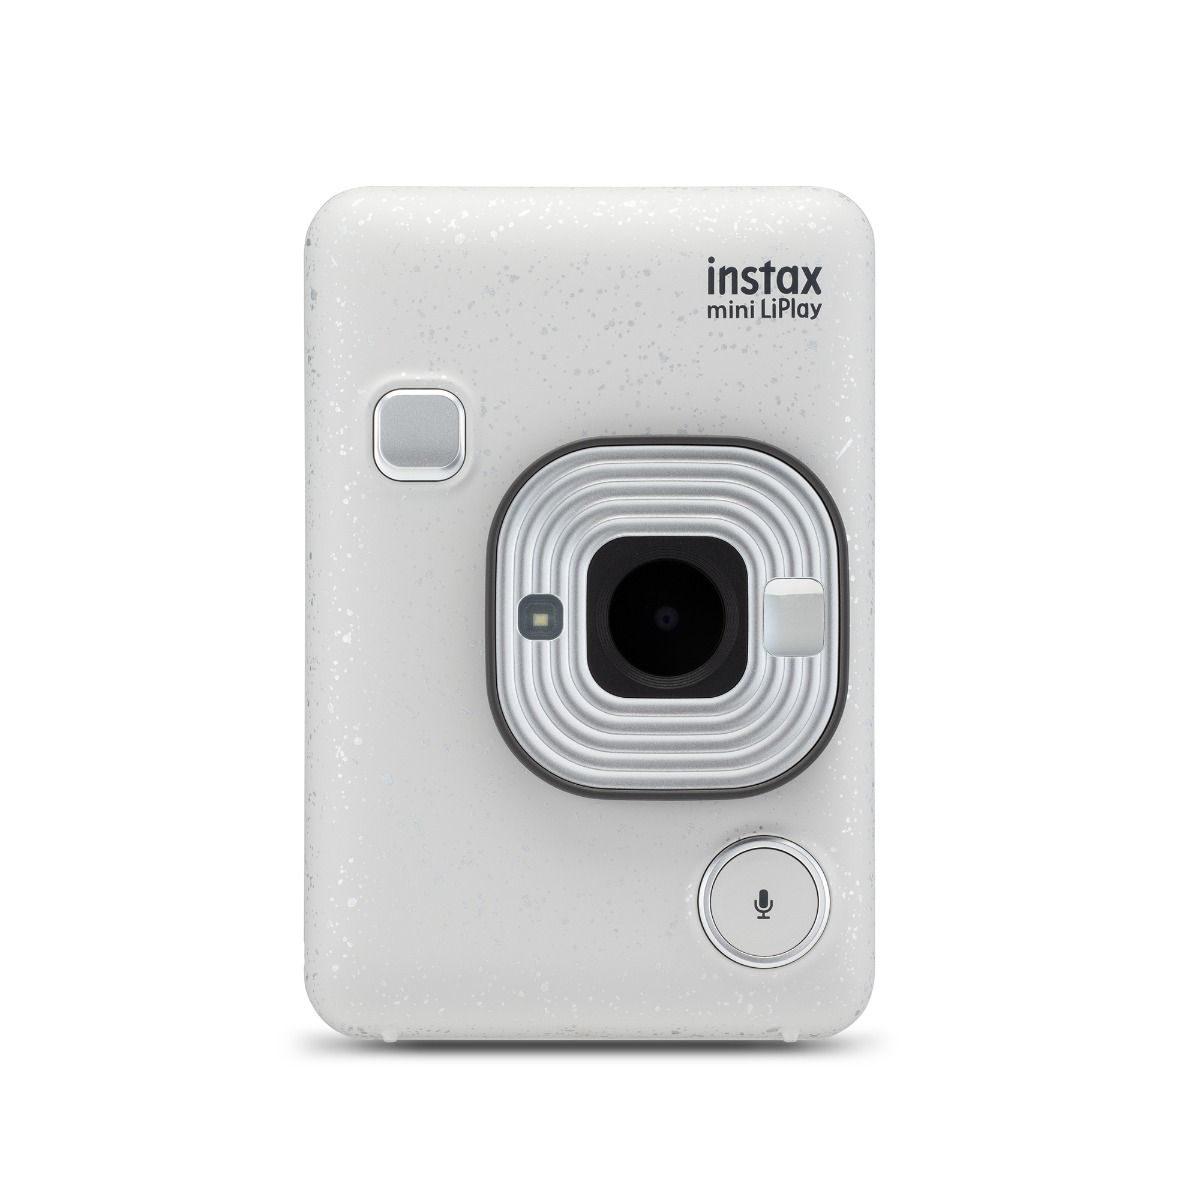 Fujifilm Instax Mini Liplay camera Stone White